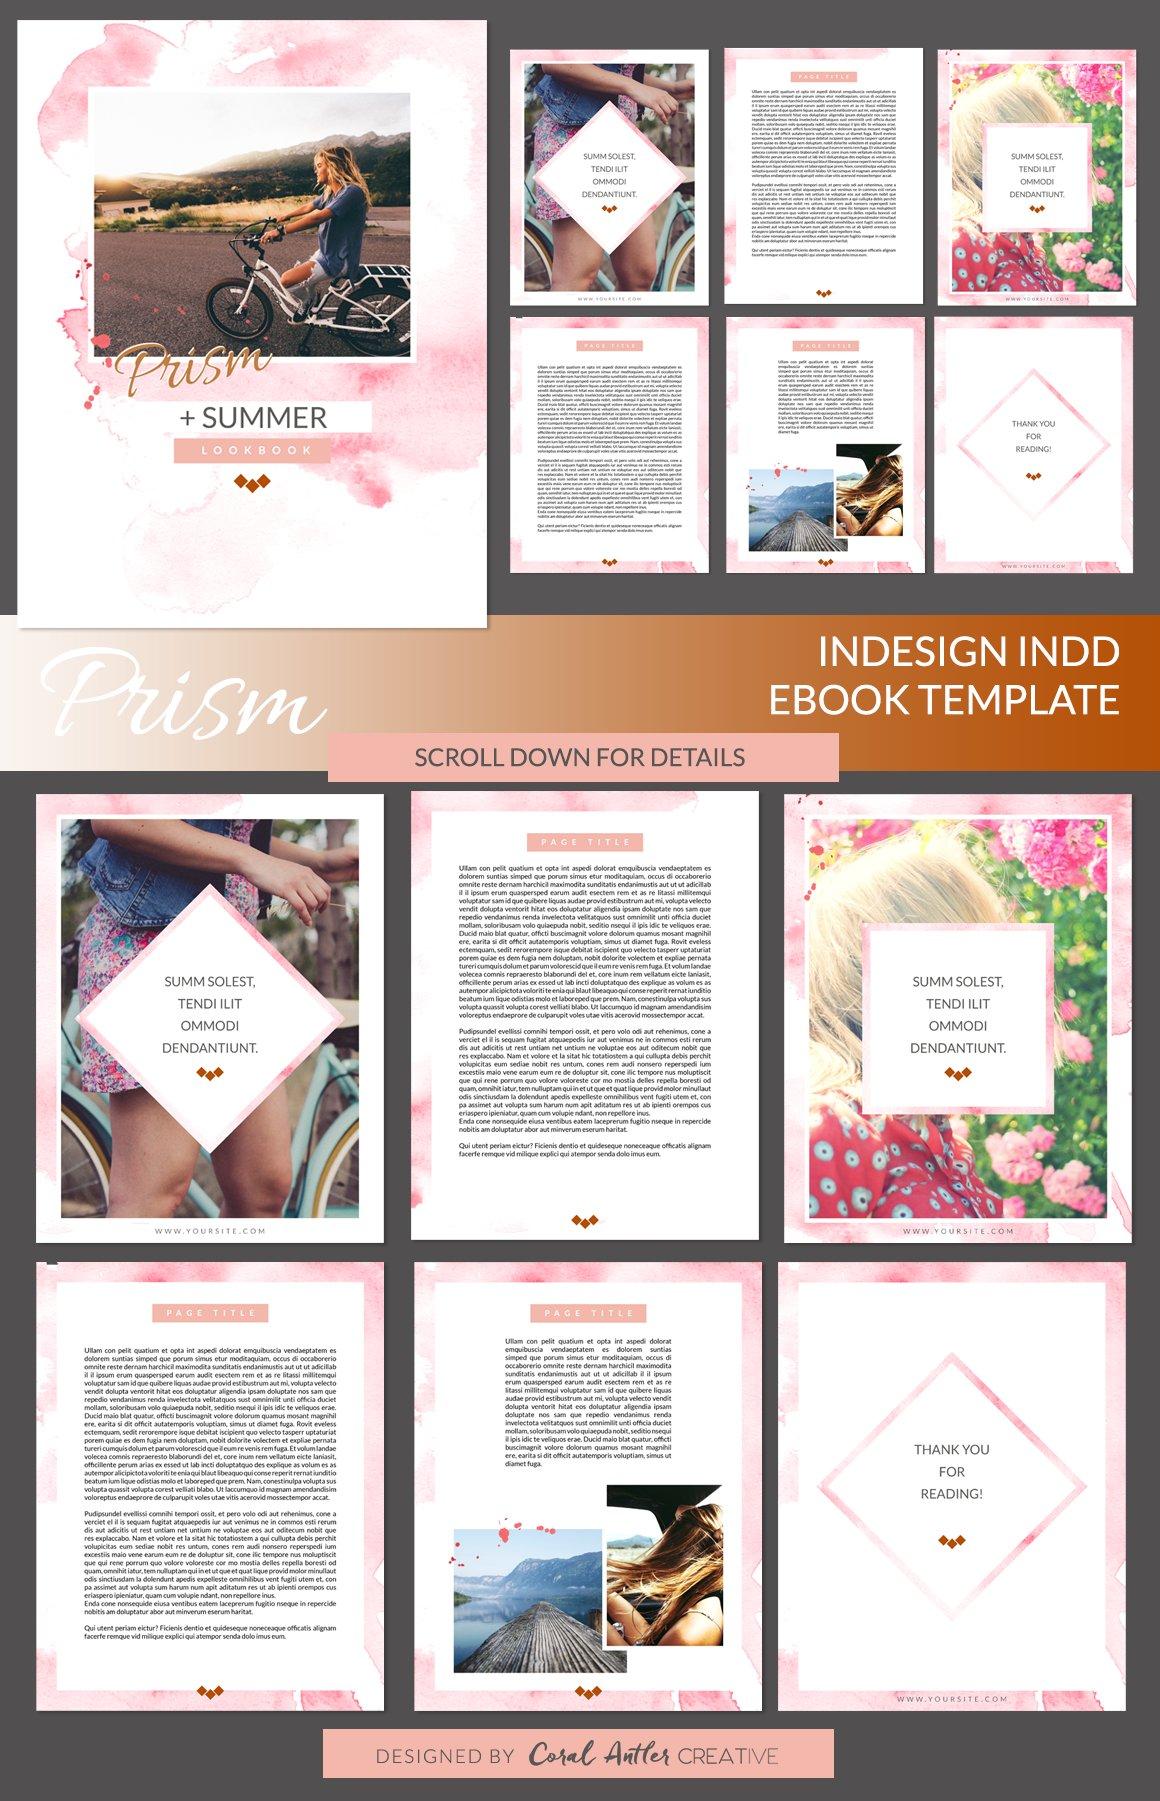 free ebook templates - prism indesign ebook template presentation templates